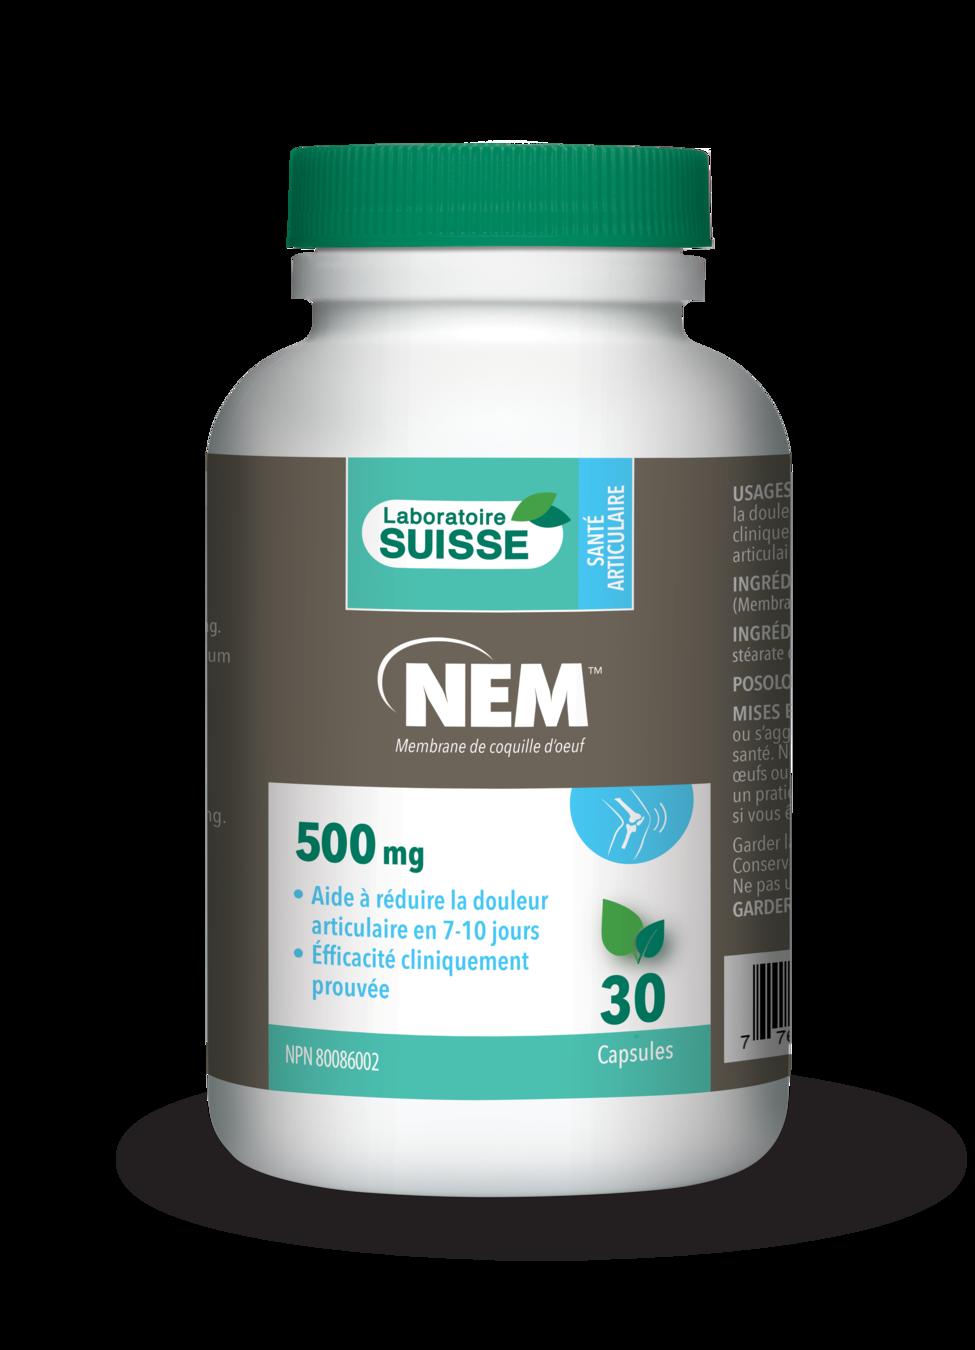 NEM 500 mg